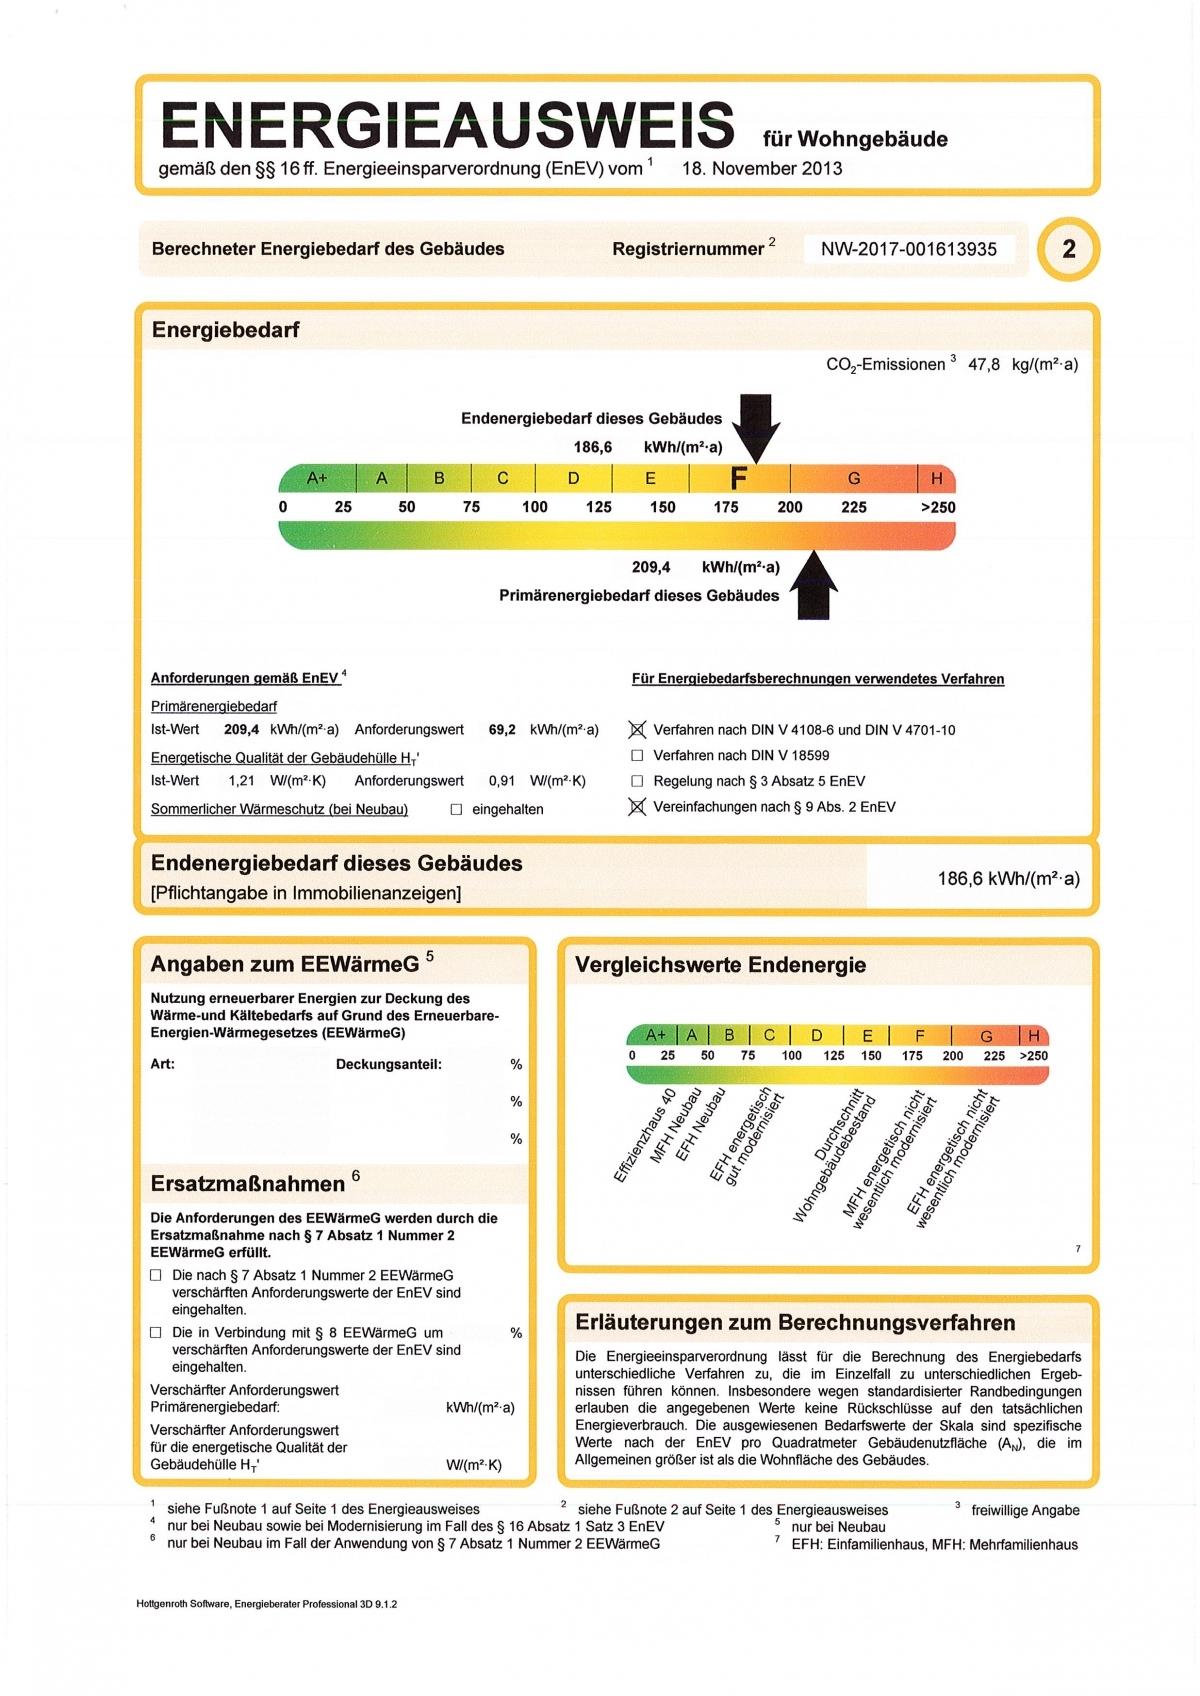 Energieausweis (2)